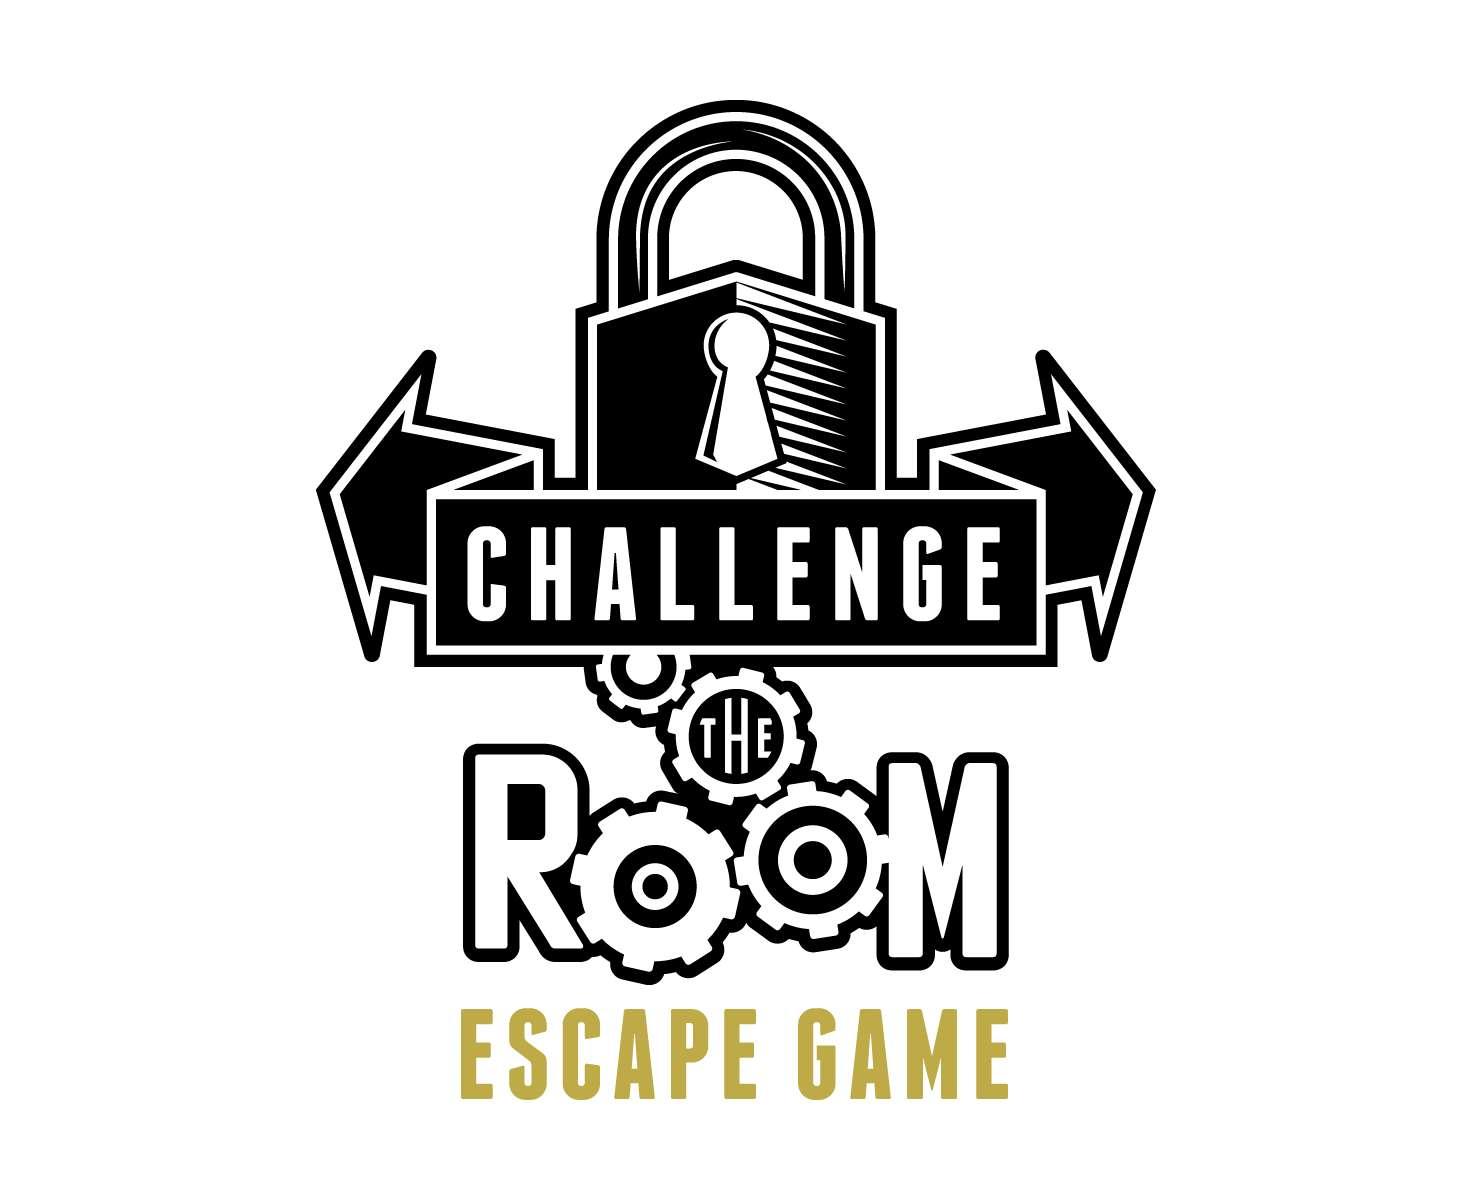 logo-challenge-the-room